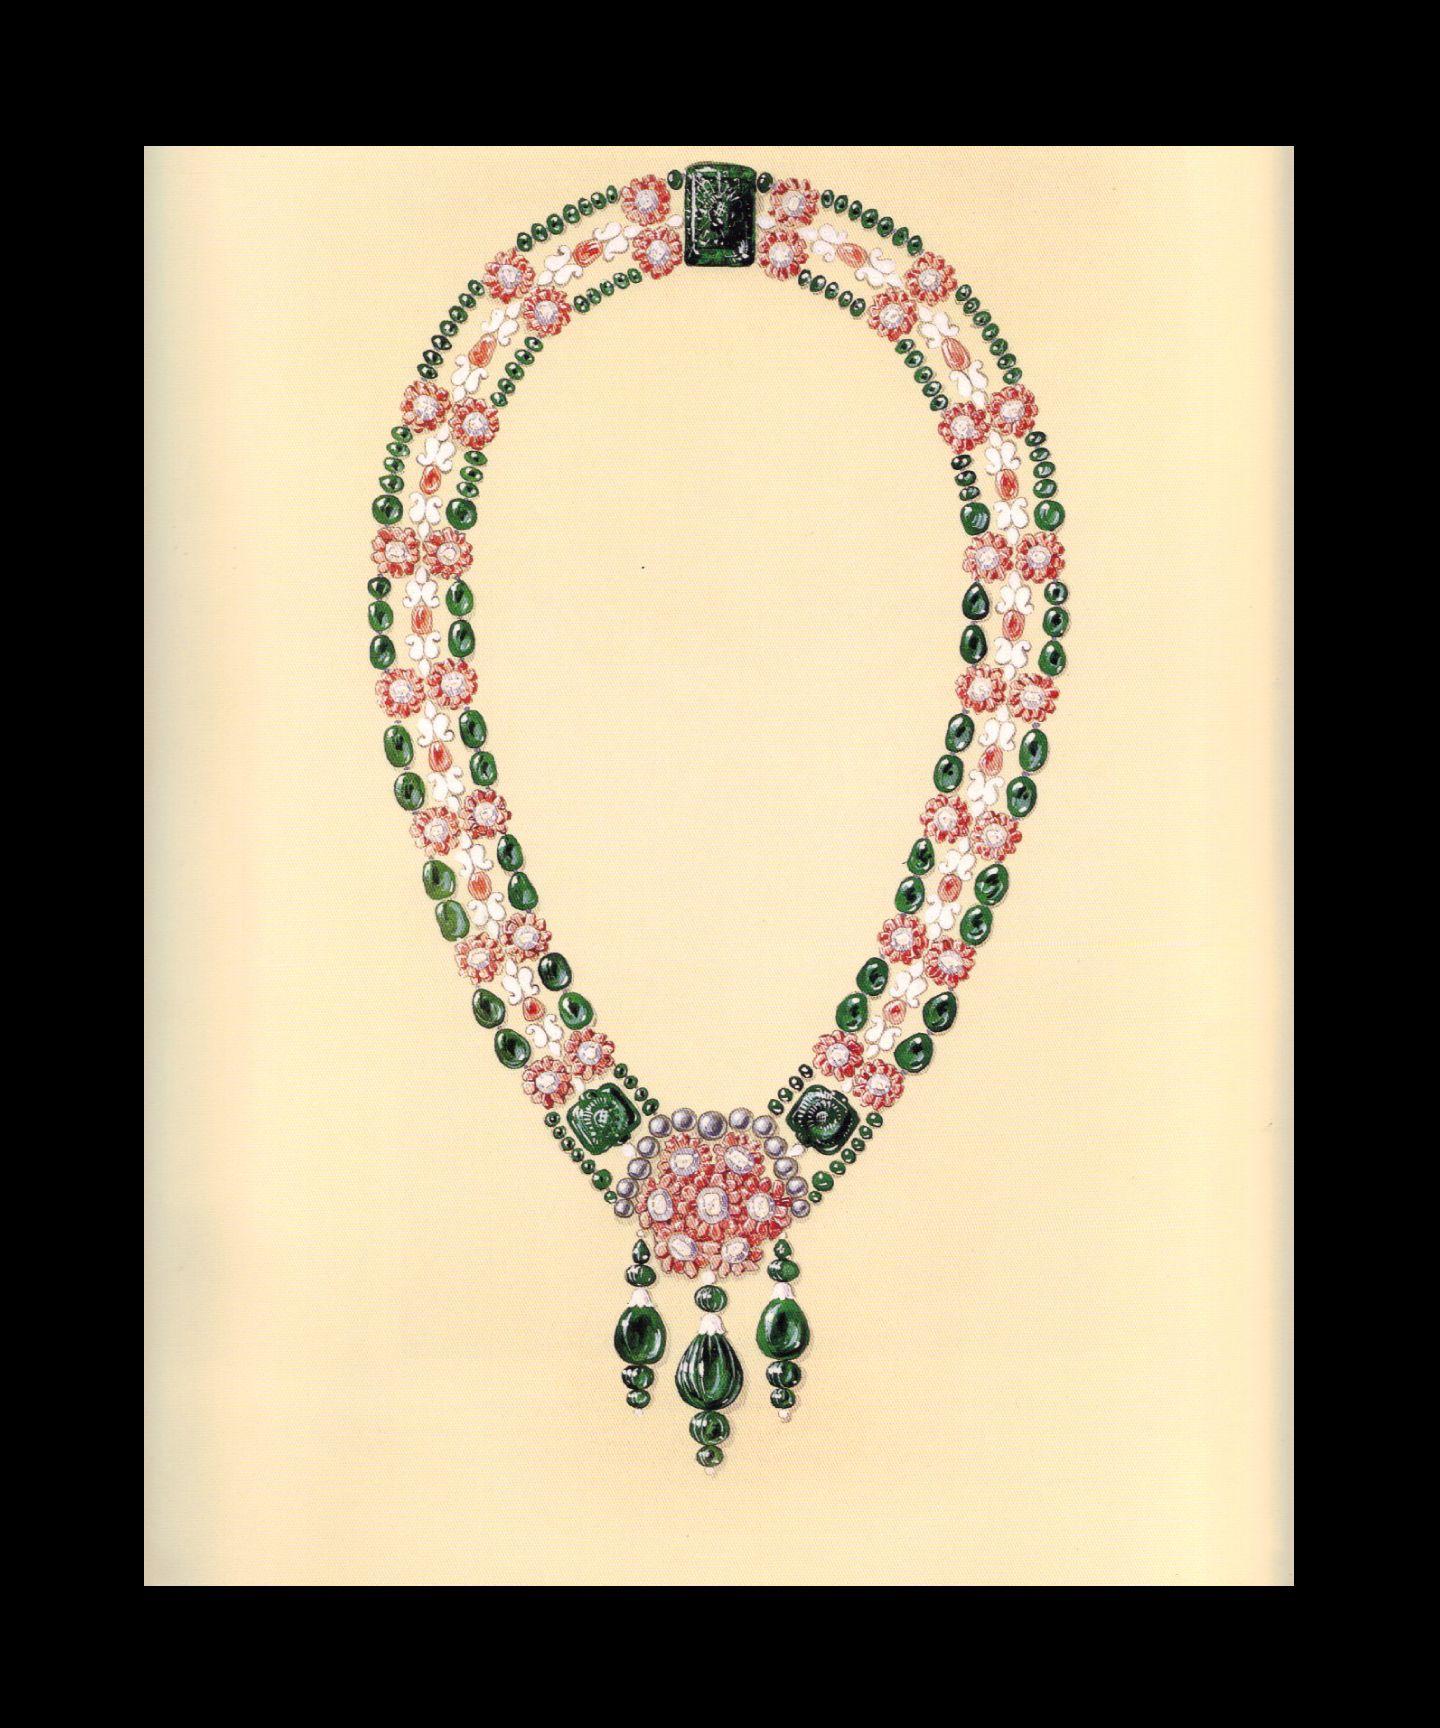 1928 Boucheron Bib Collar Design for Maharaja Bhupinder Singh of Patiala